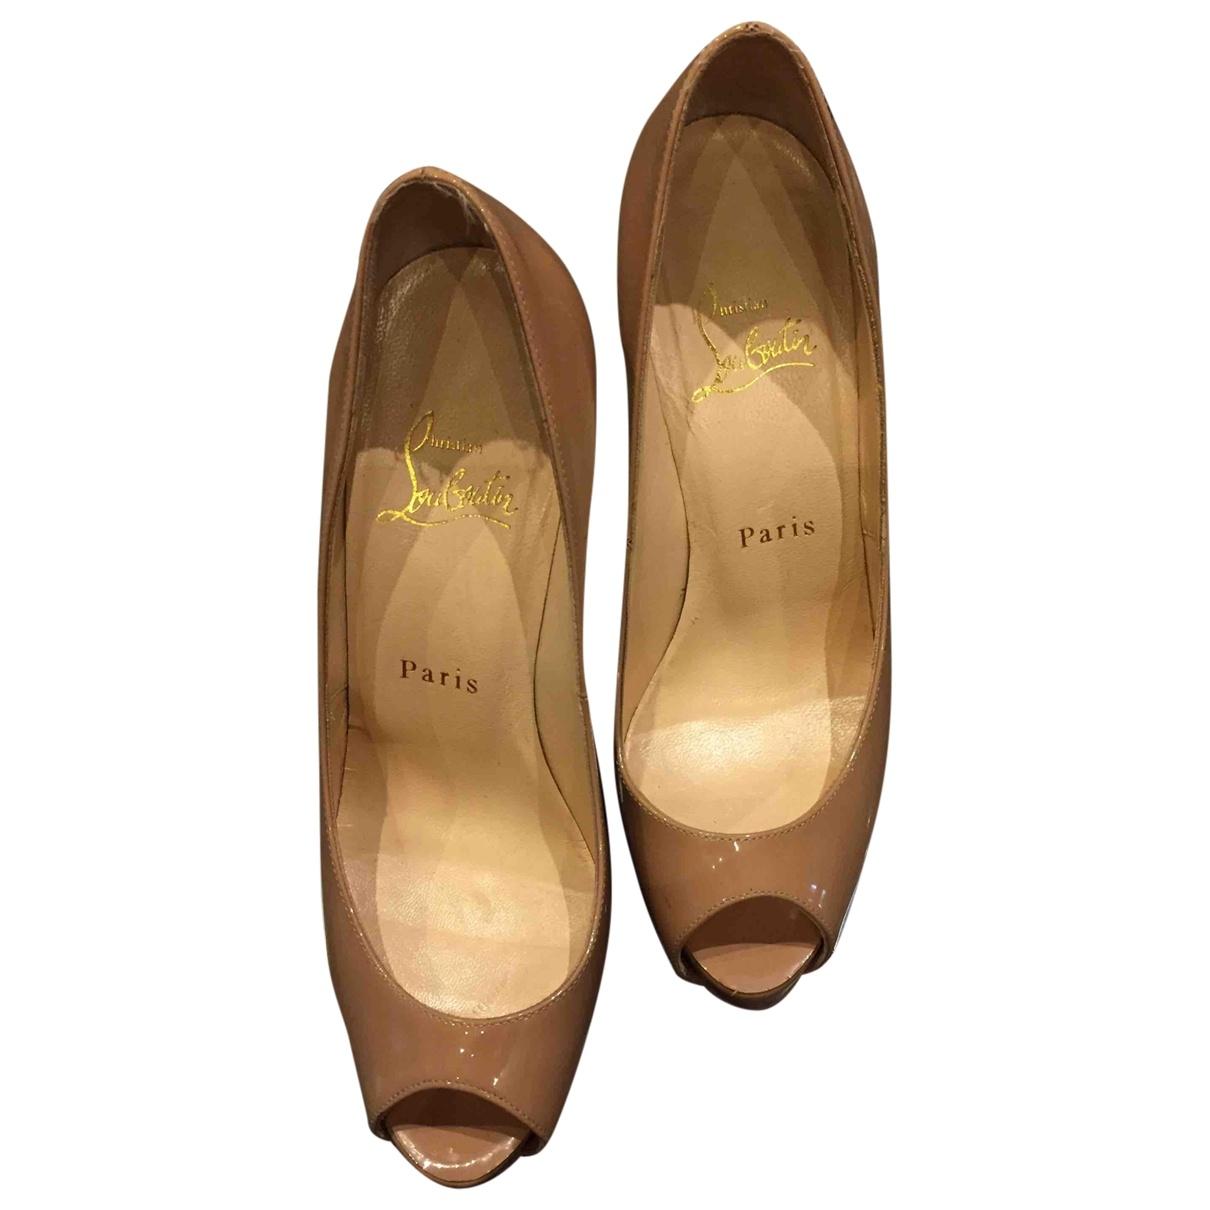 Christian Louboutin \N Beige Patent leather Heels for Women 36.5 EU